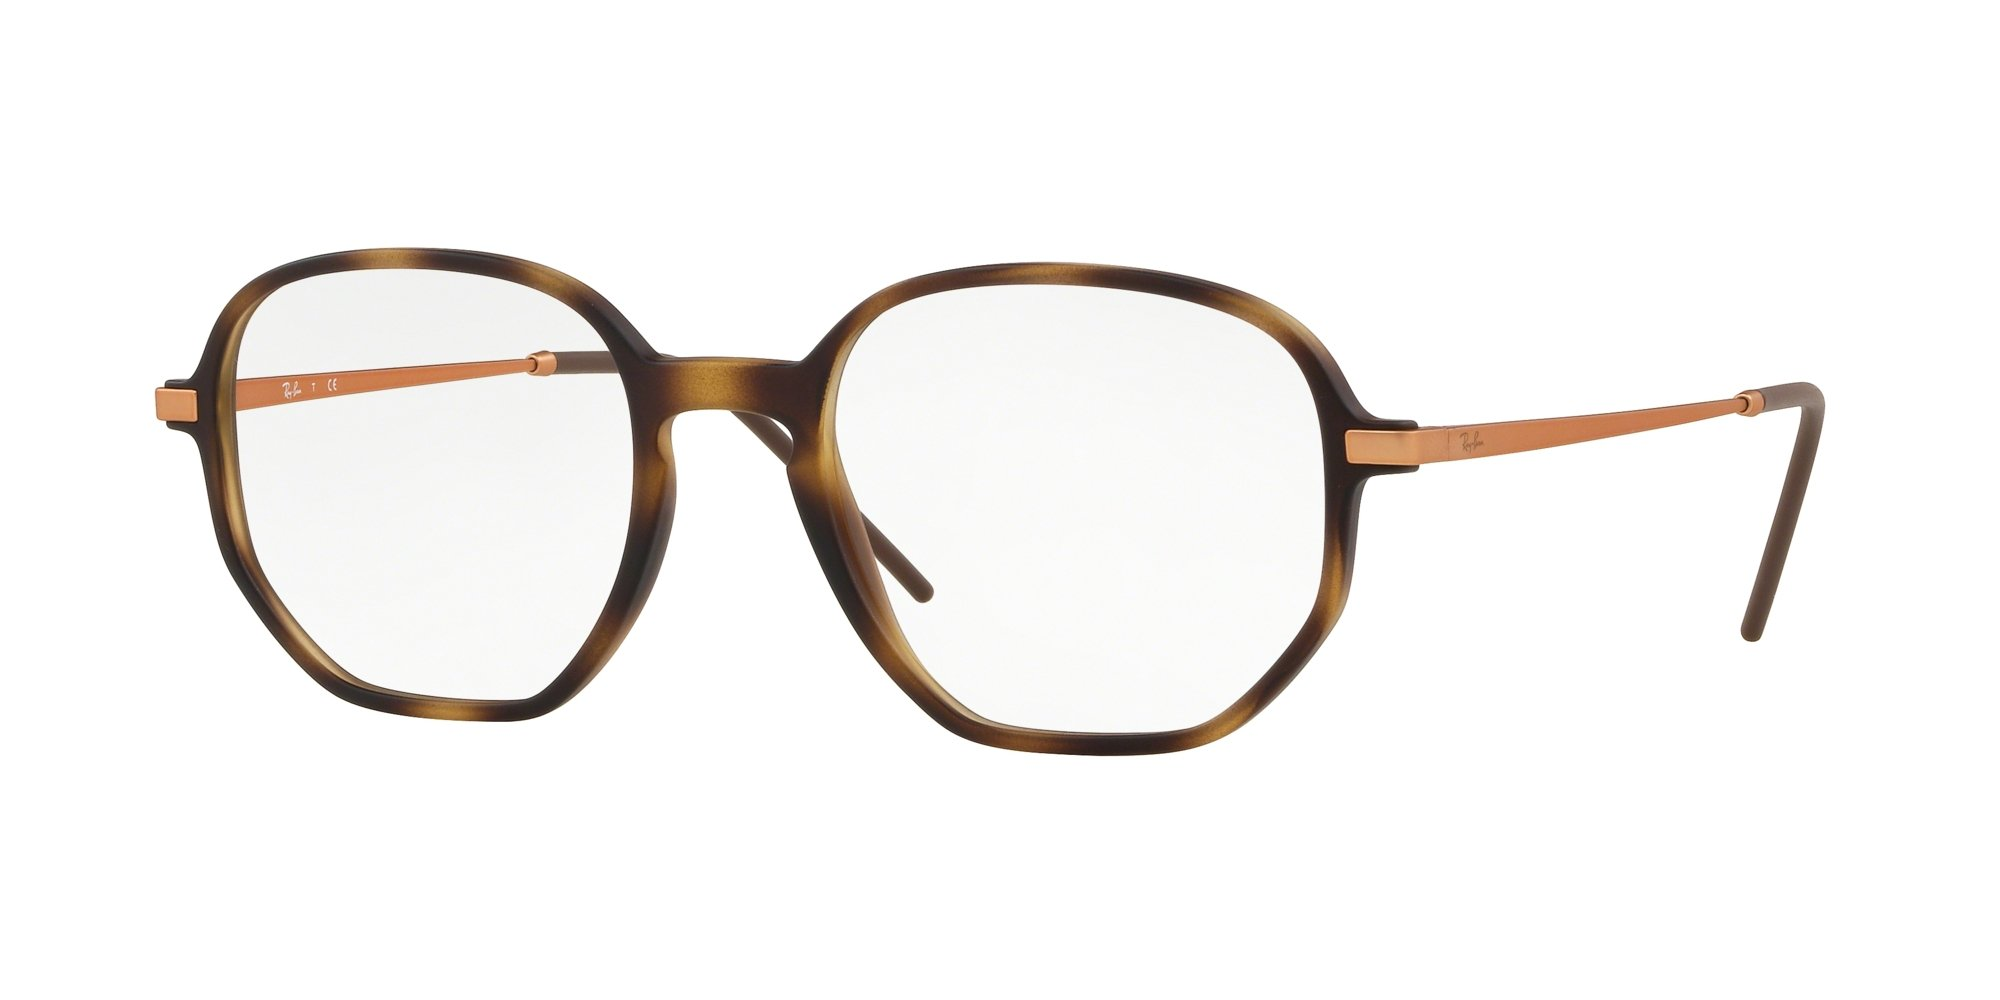 Ray-Ban Unisex RX7152 Eyeglasses Rubber Havana 52mm